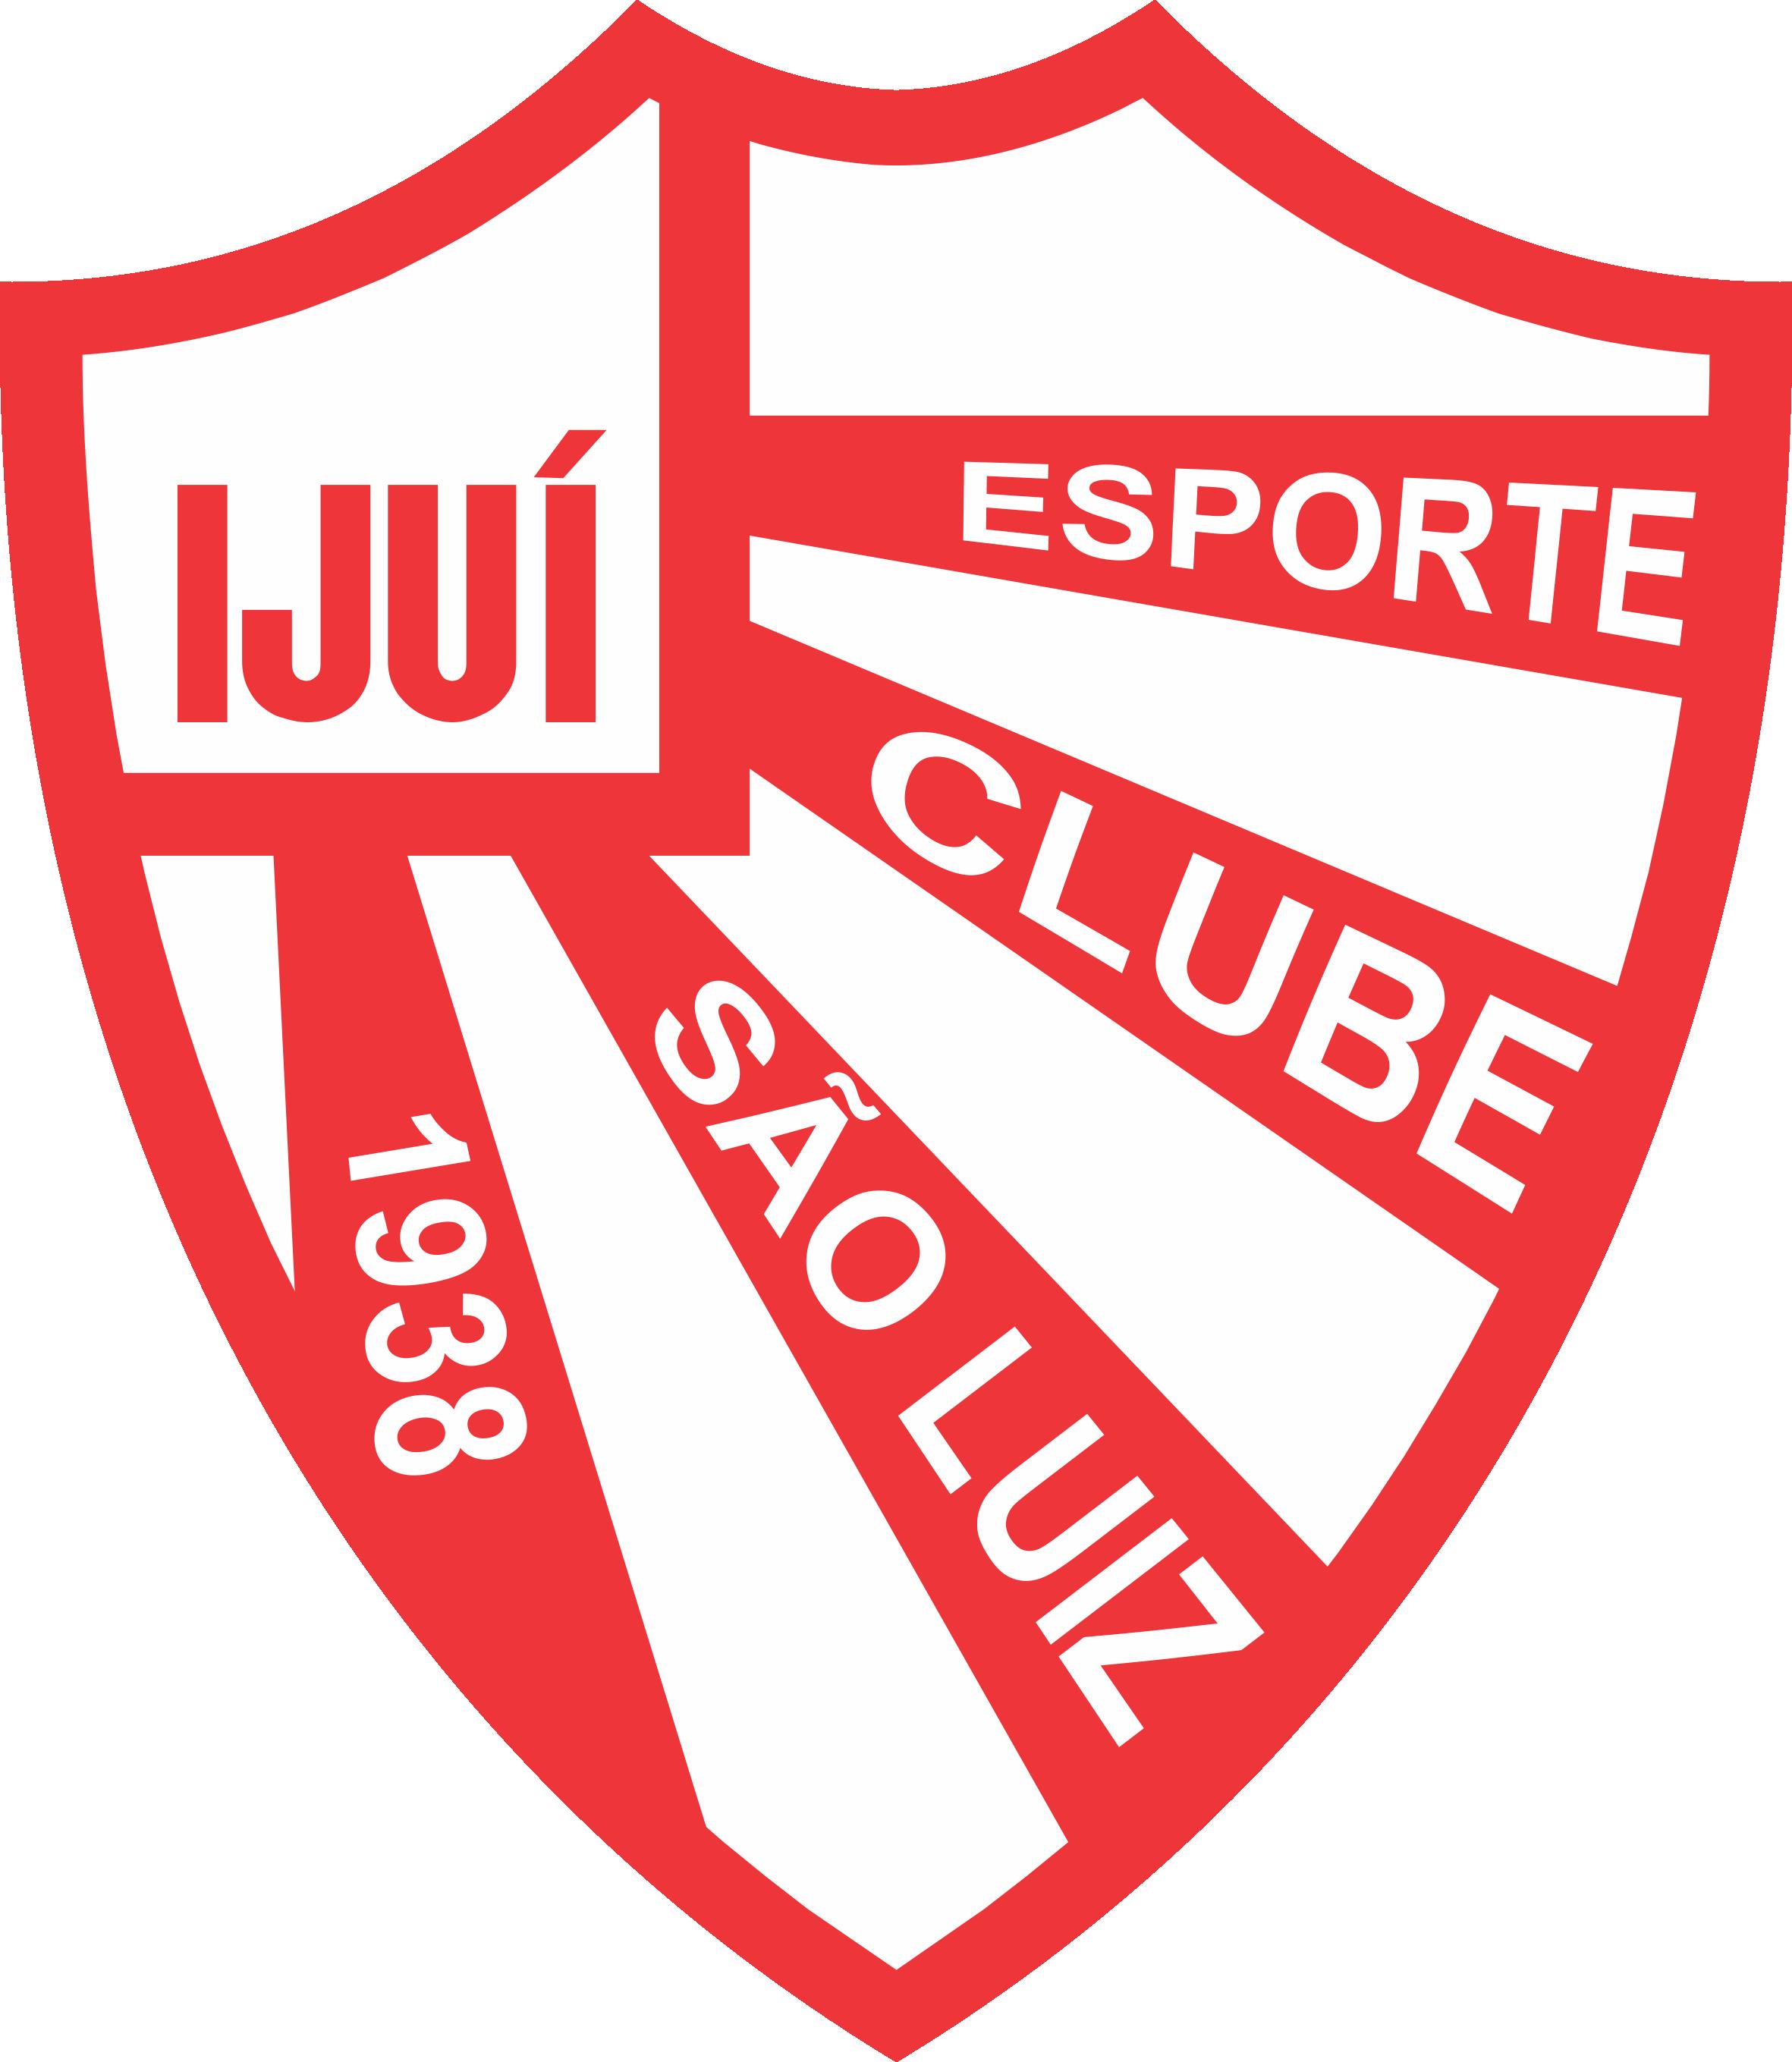 Sao Luiz team logo